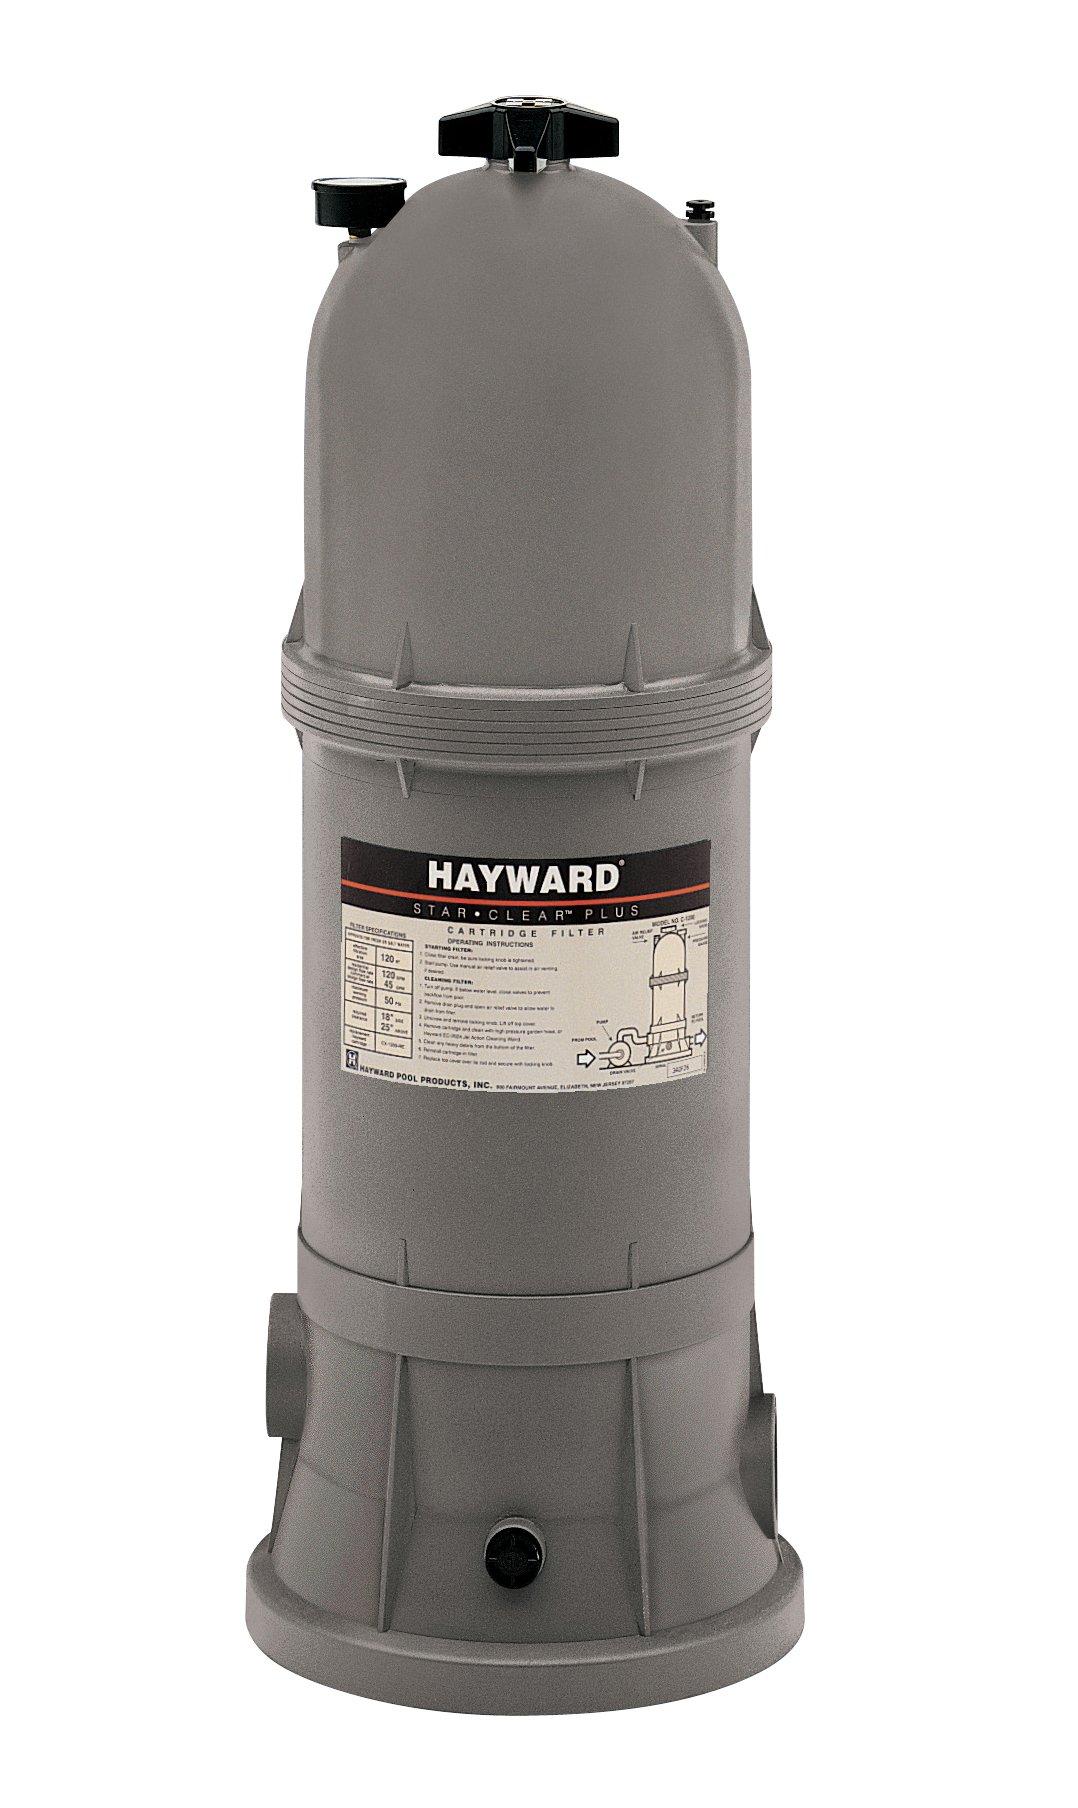 Hayward C751 Star-Clear Plus 75-Square-Foot 1-1/2-Inch FIP Pipe Cartridge Pool Filter